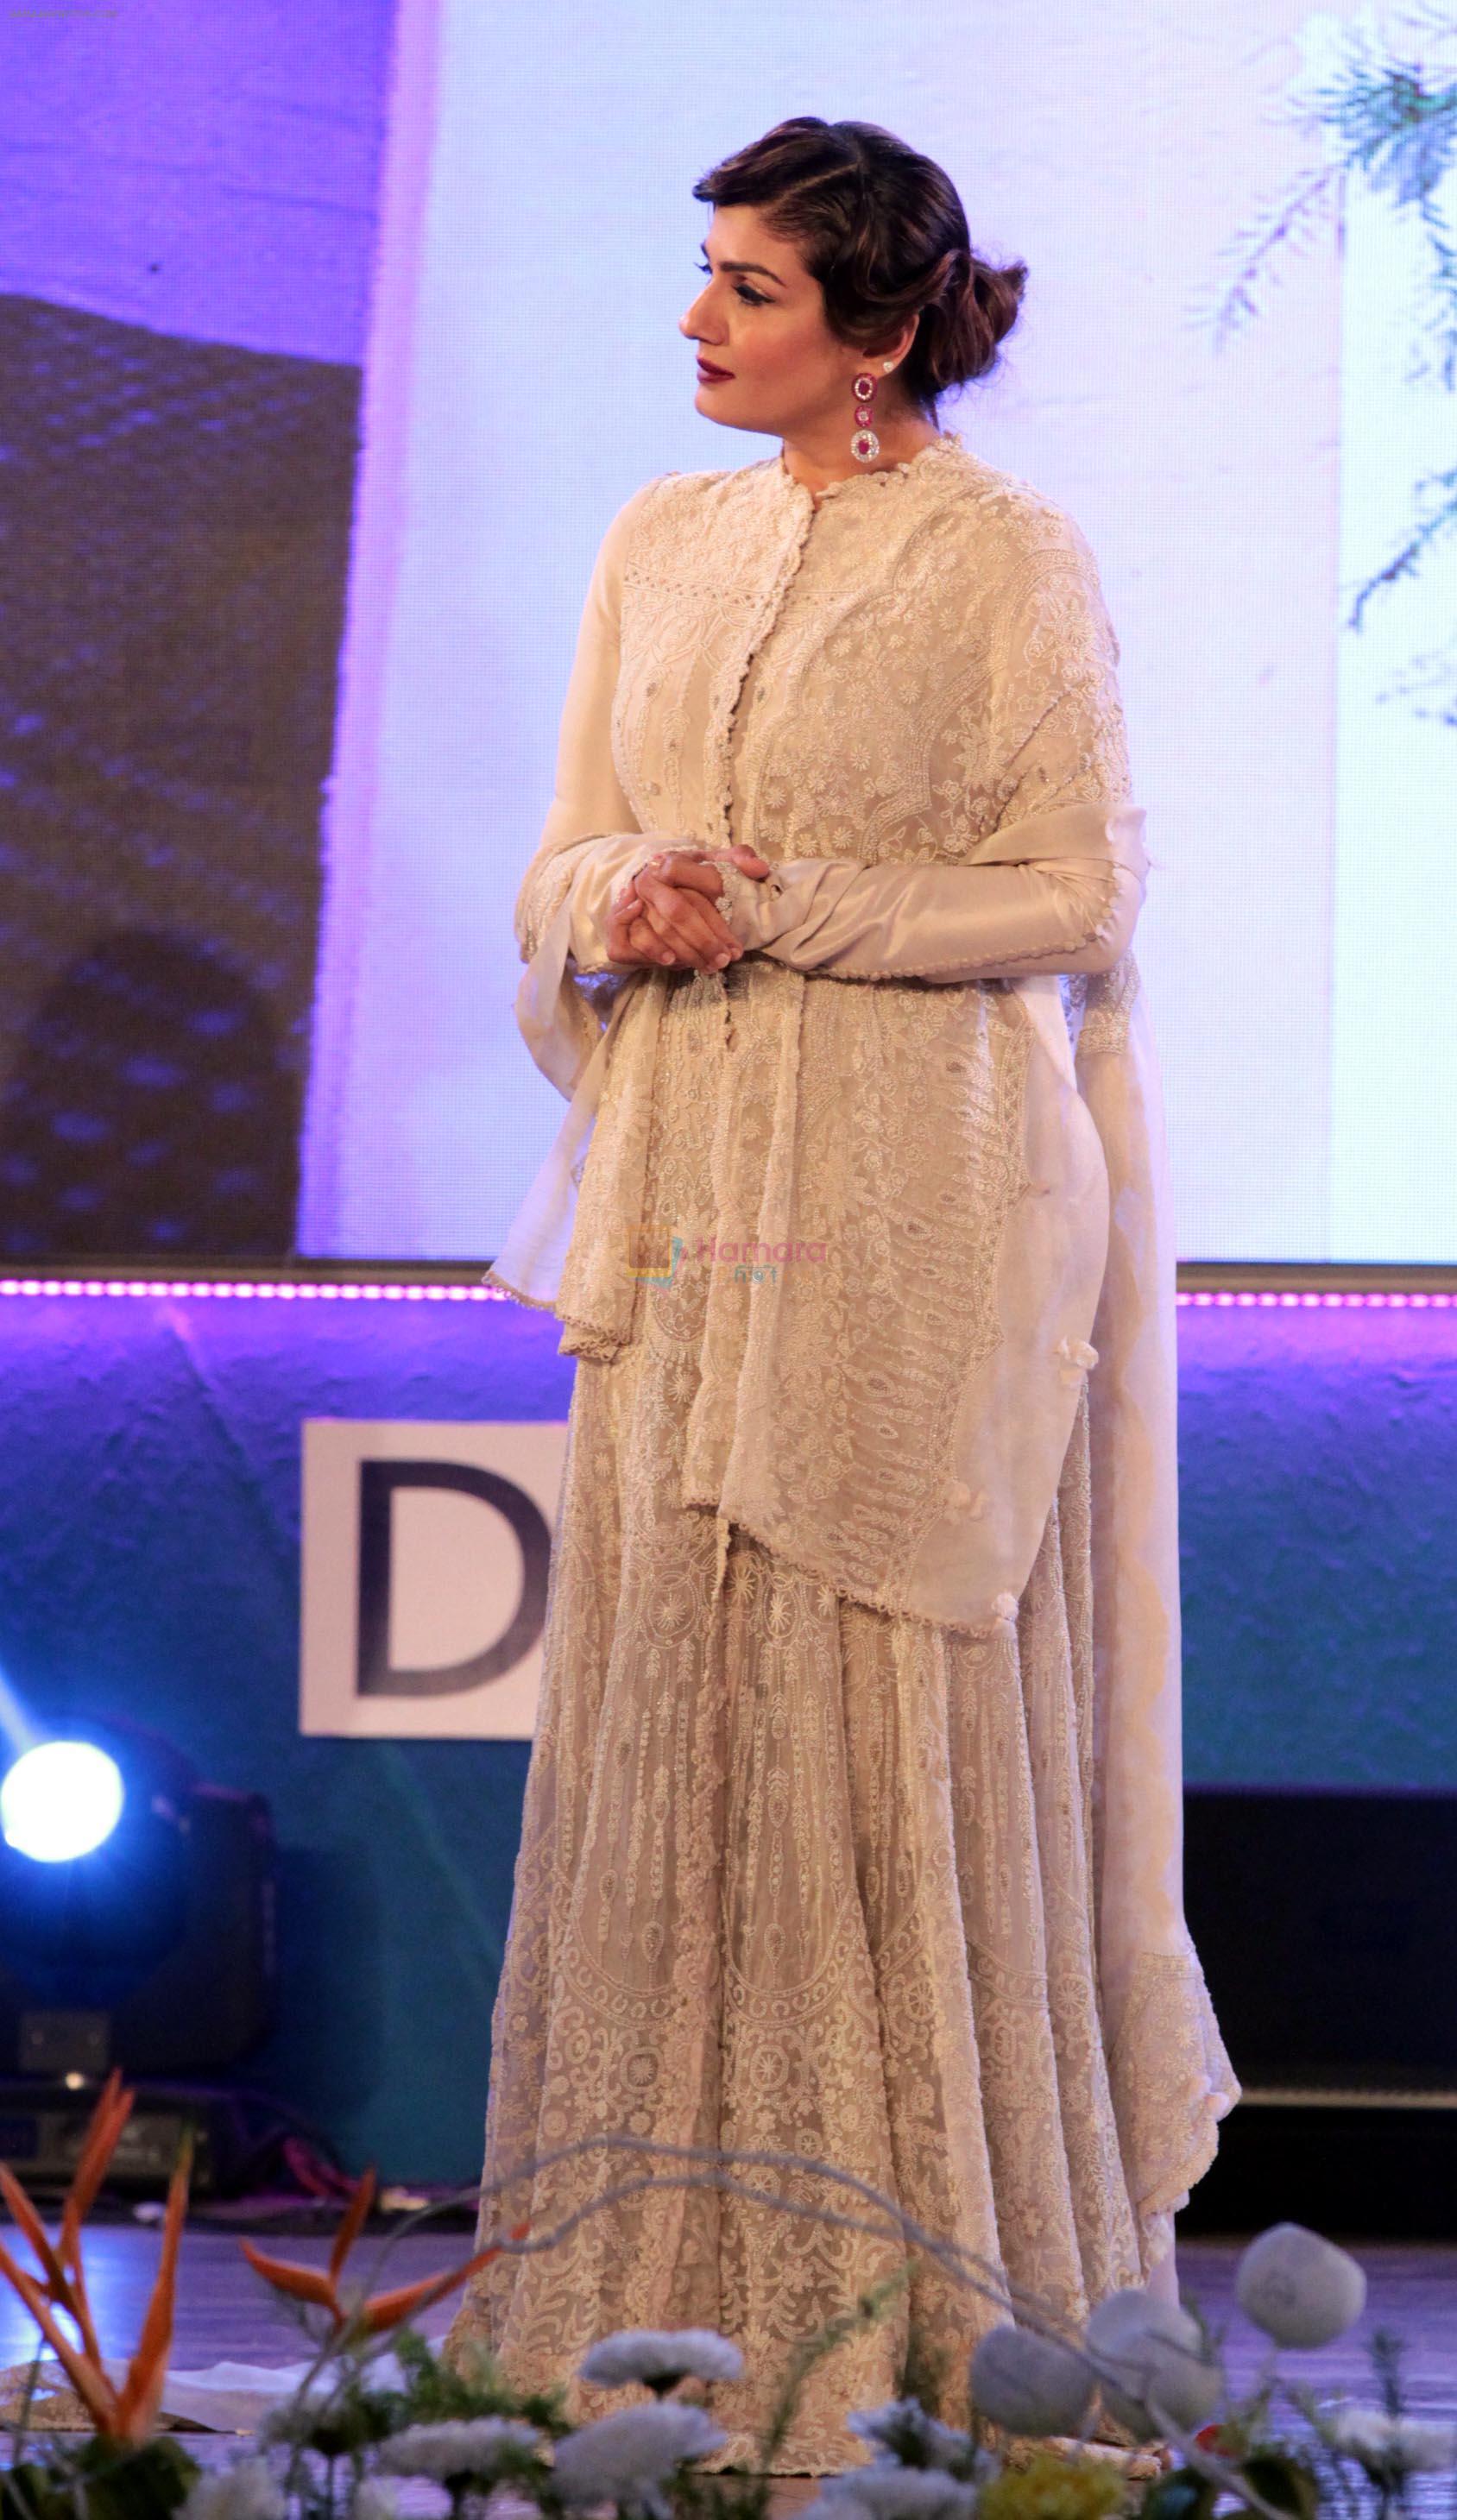 Raveena Tandon at closing ceremony of Kolkata film festival on 18th Nov 2016